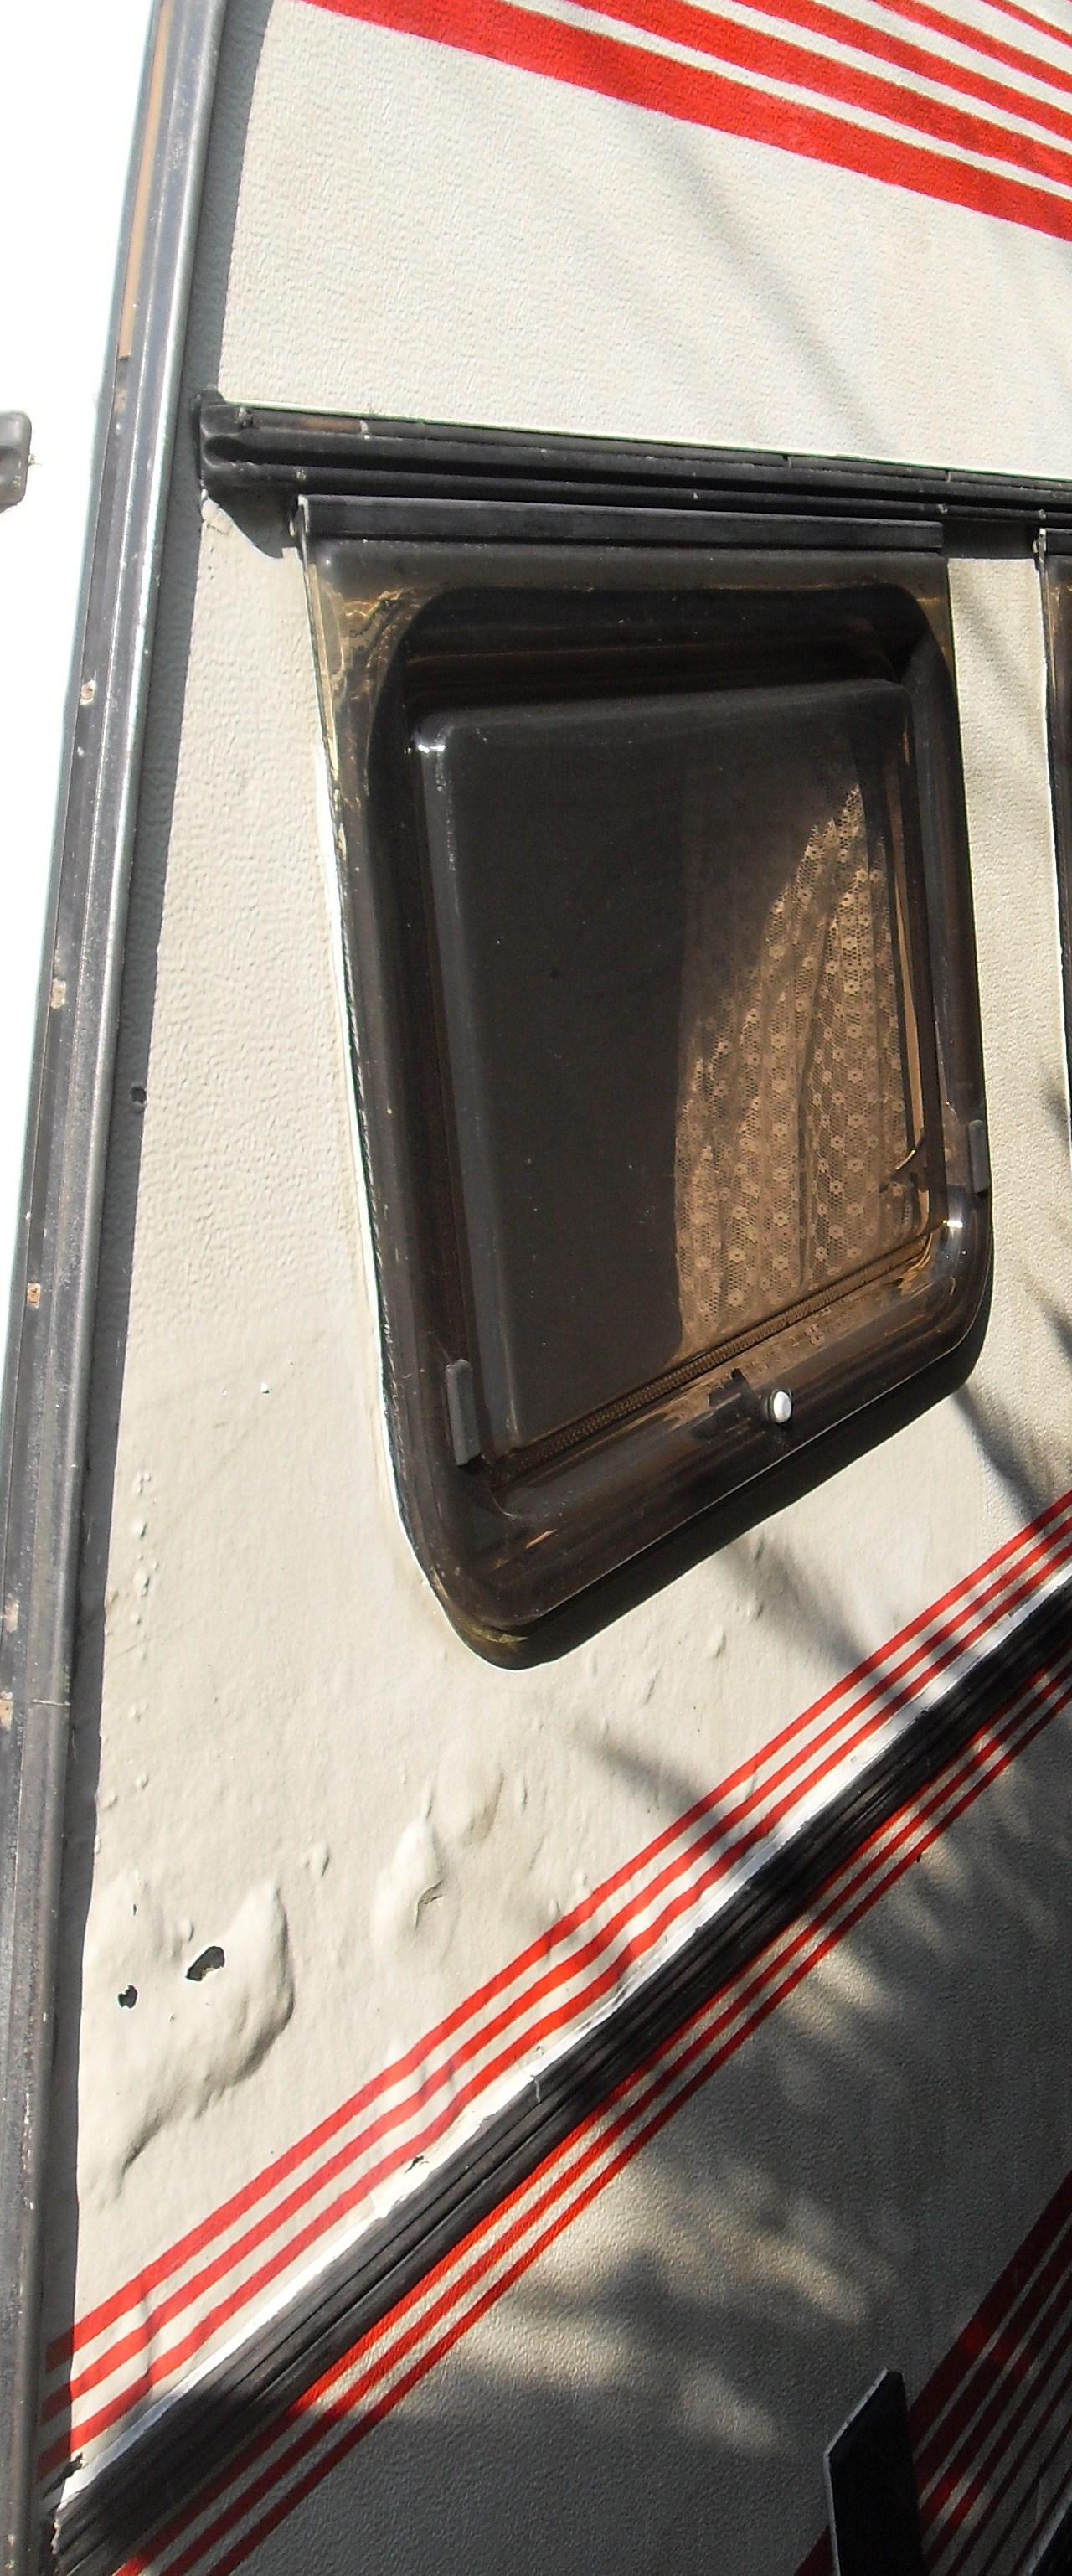 Reforma Baño Caravana:Re: REFORMA ROLLER JET 420 F